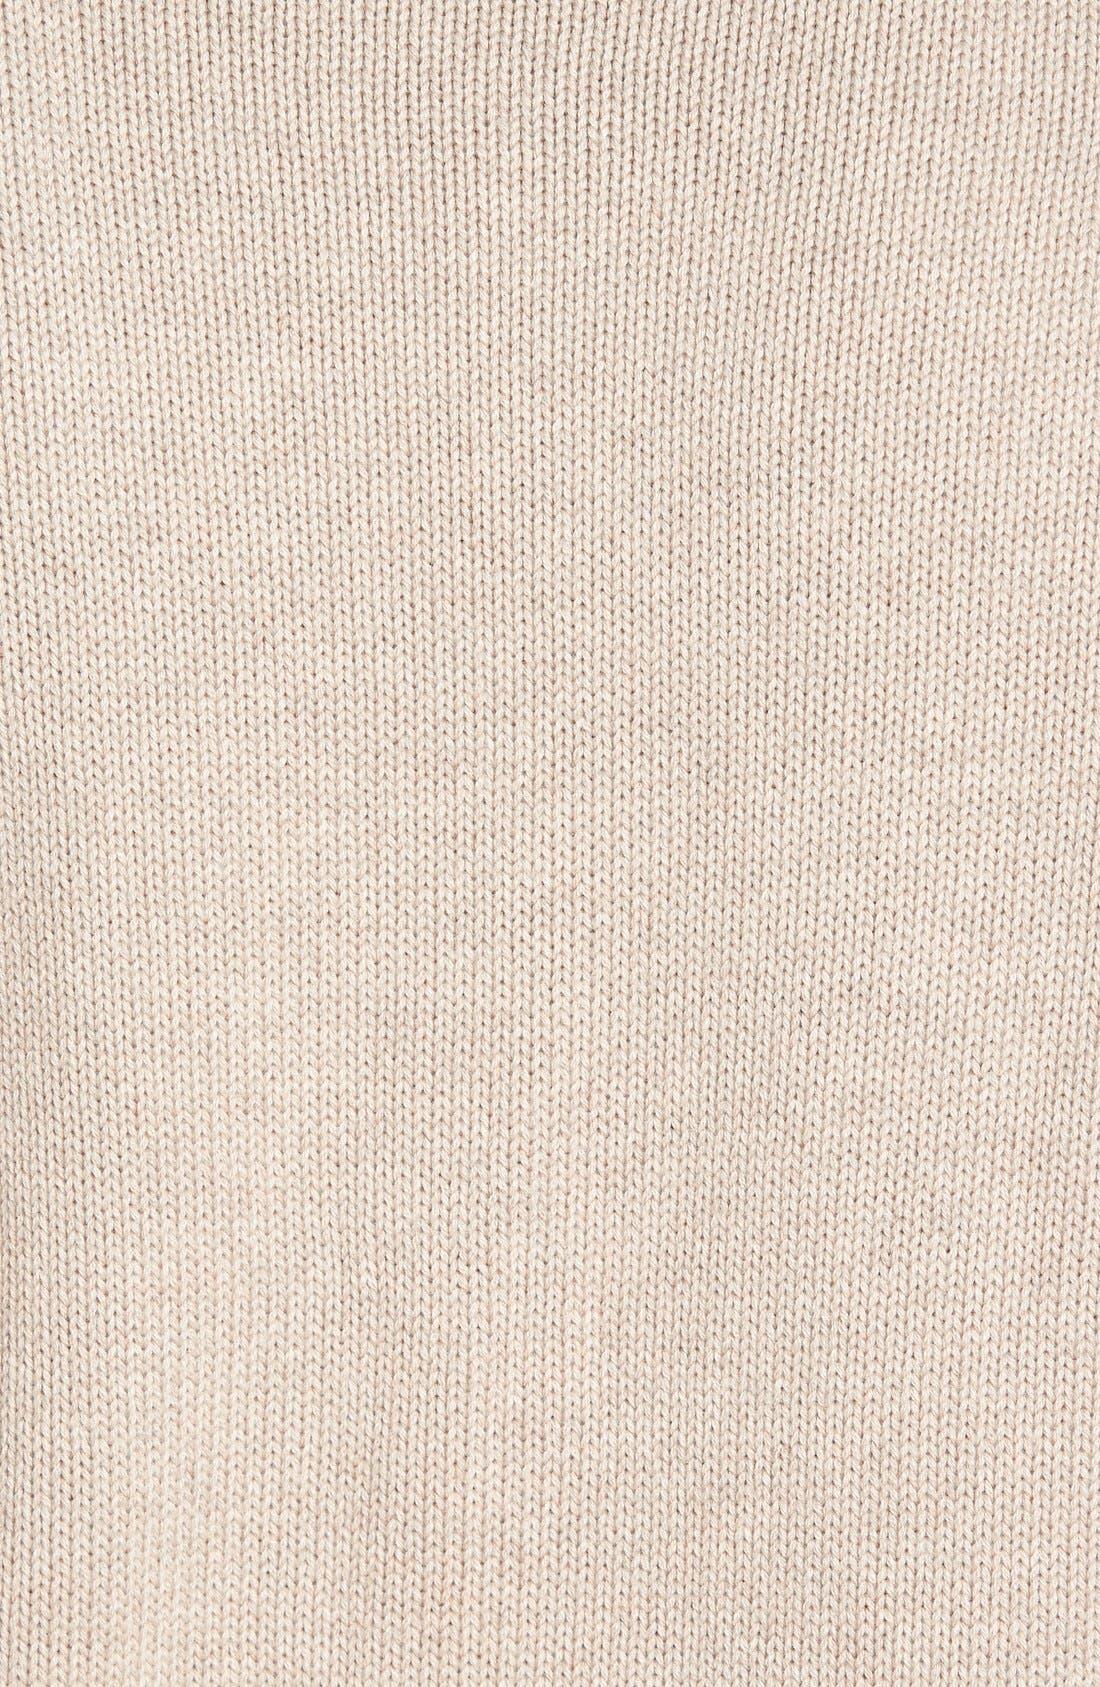 Alternate Image 5  - Nordstrom Men's Shop Chunky Turtleneck Sweater (Regular & Tall)